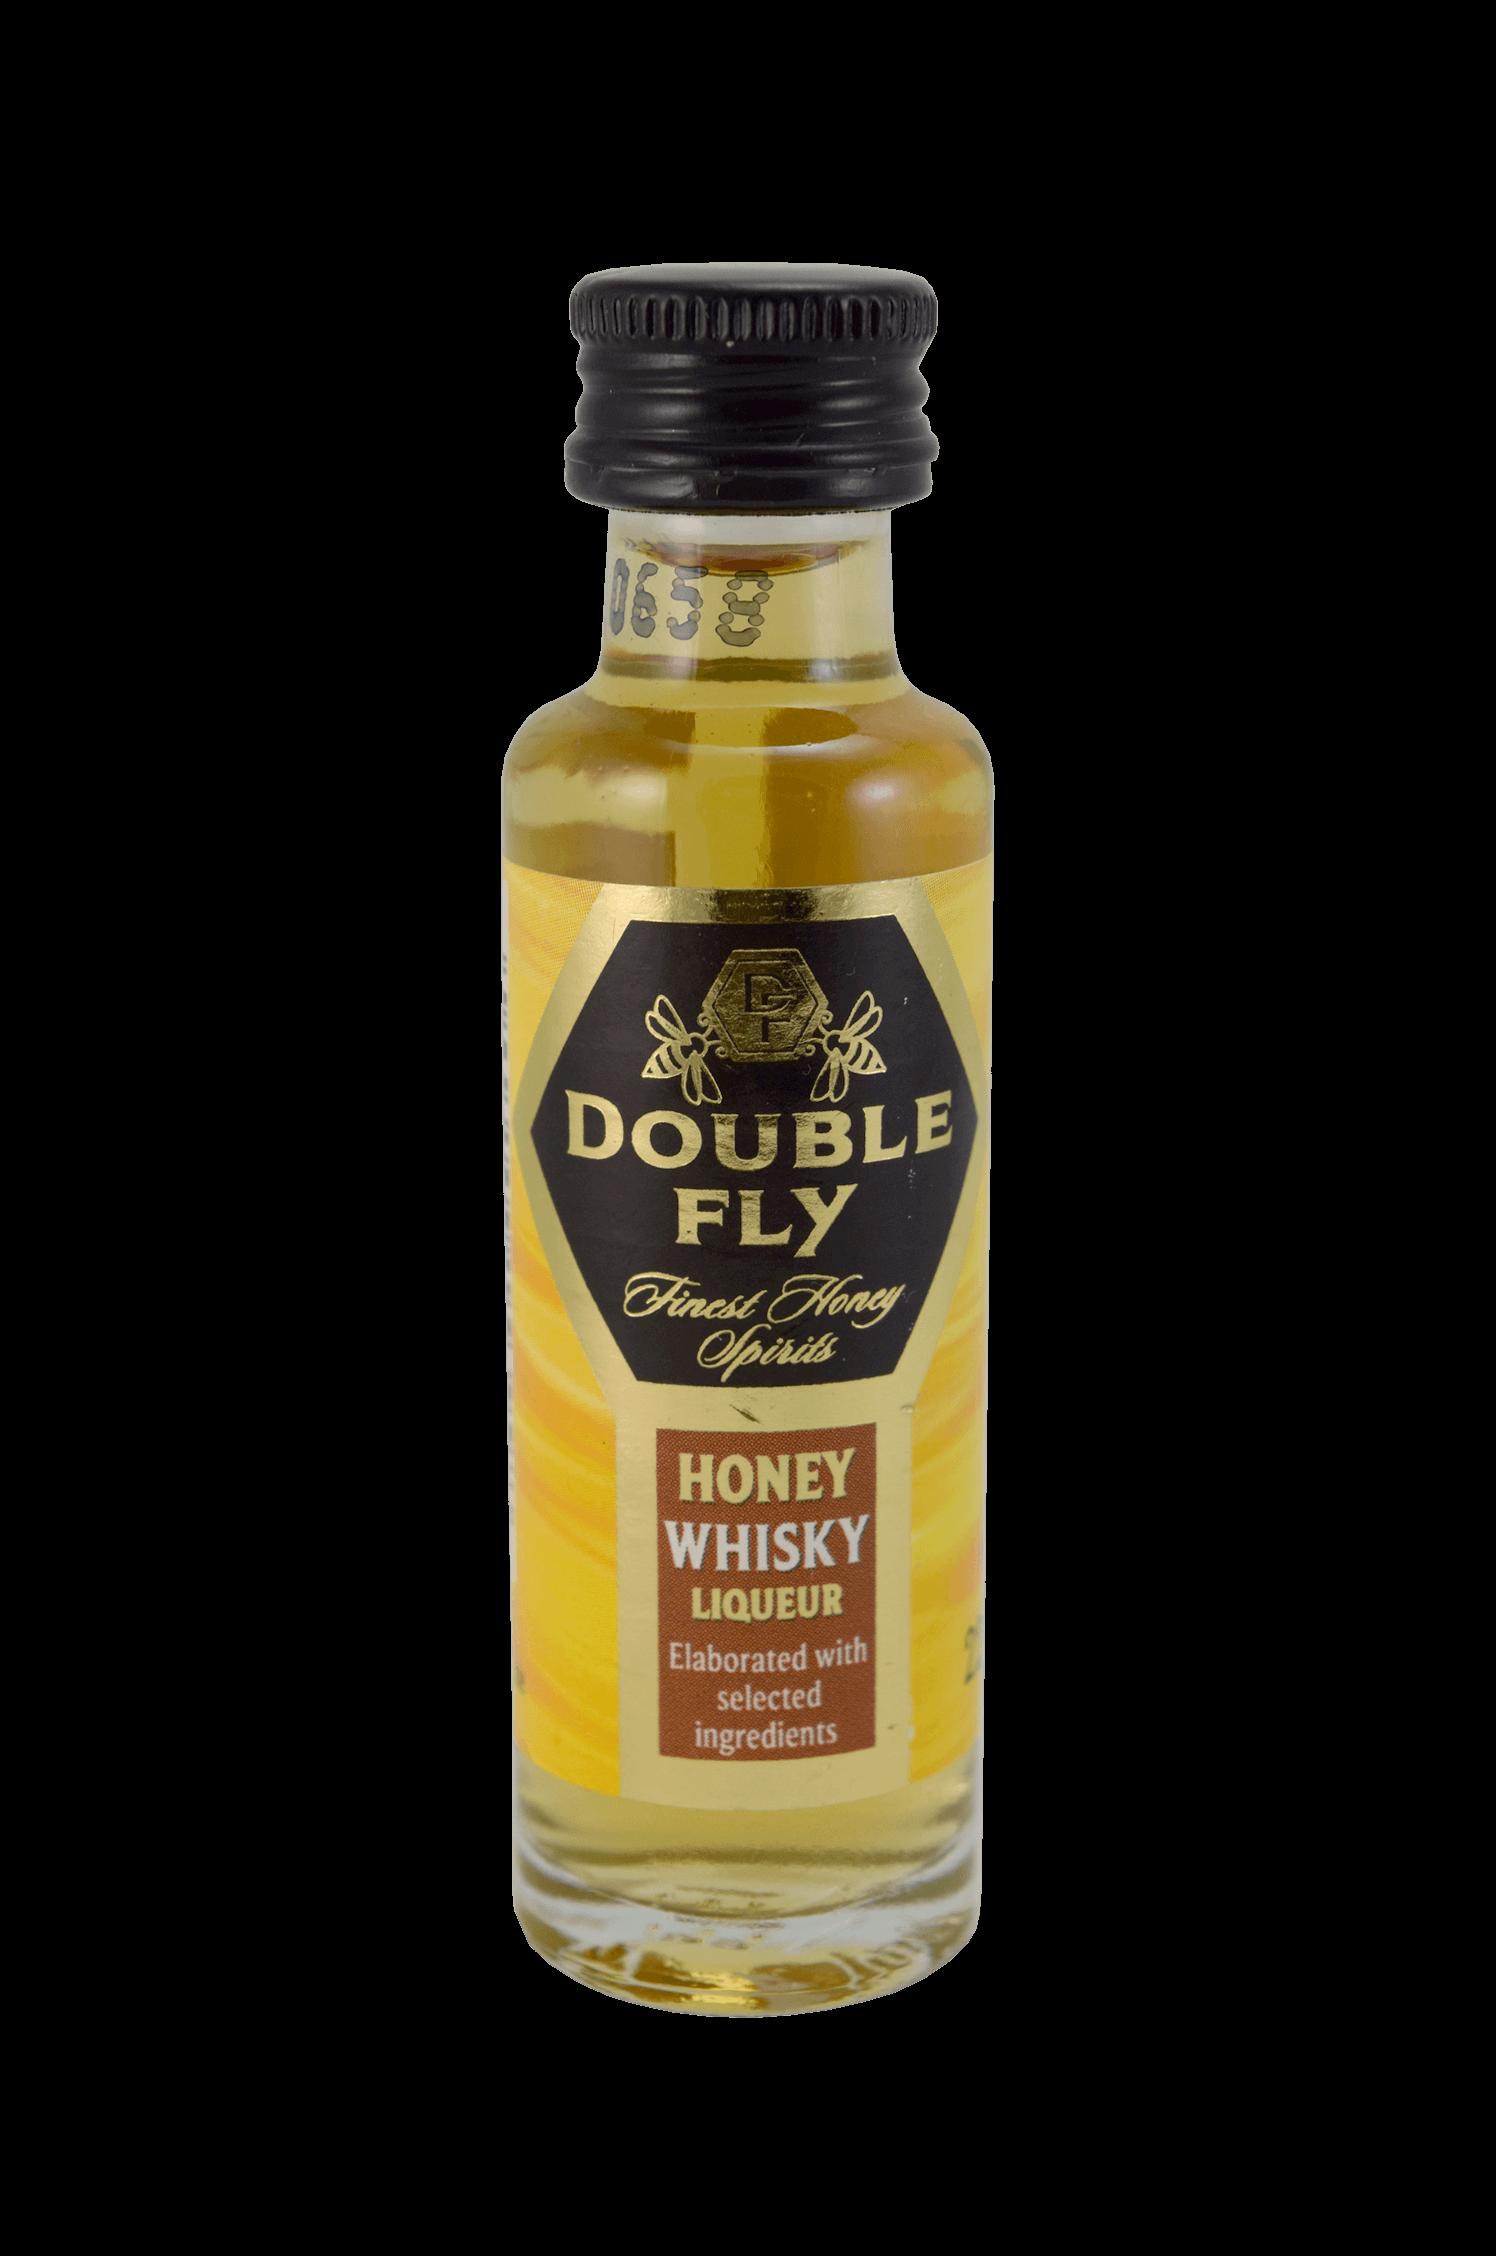 Honey Whisky Liqueur